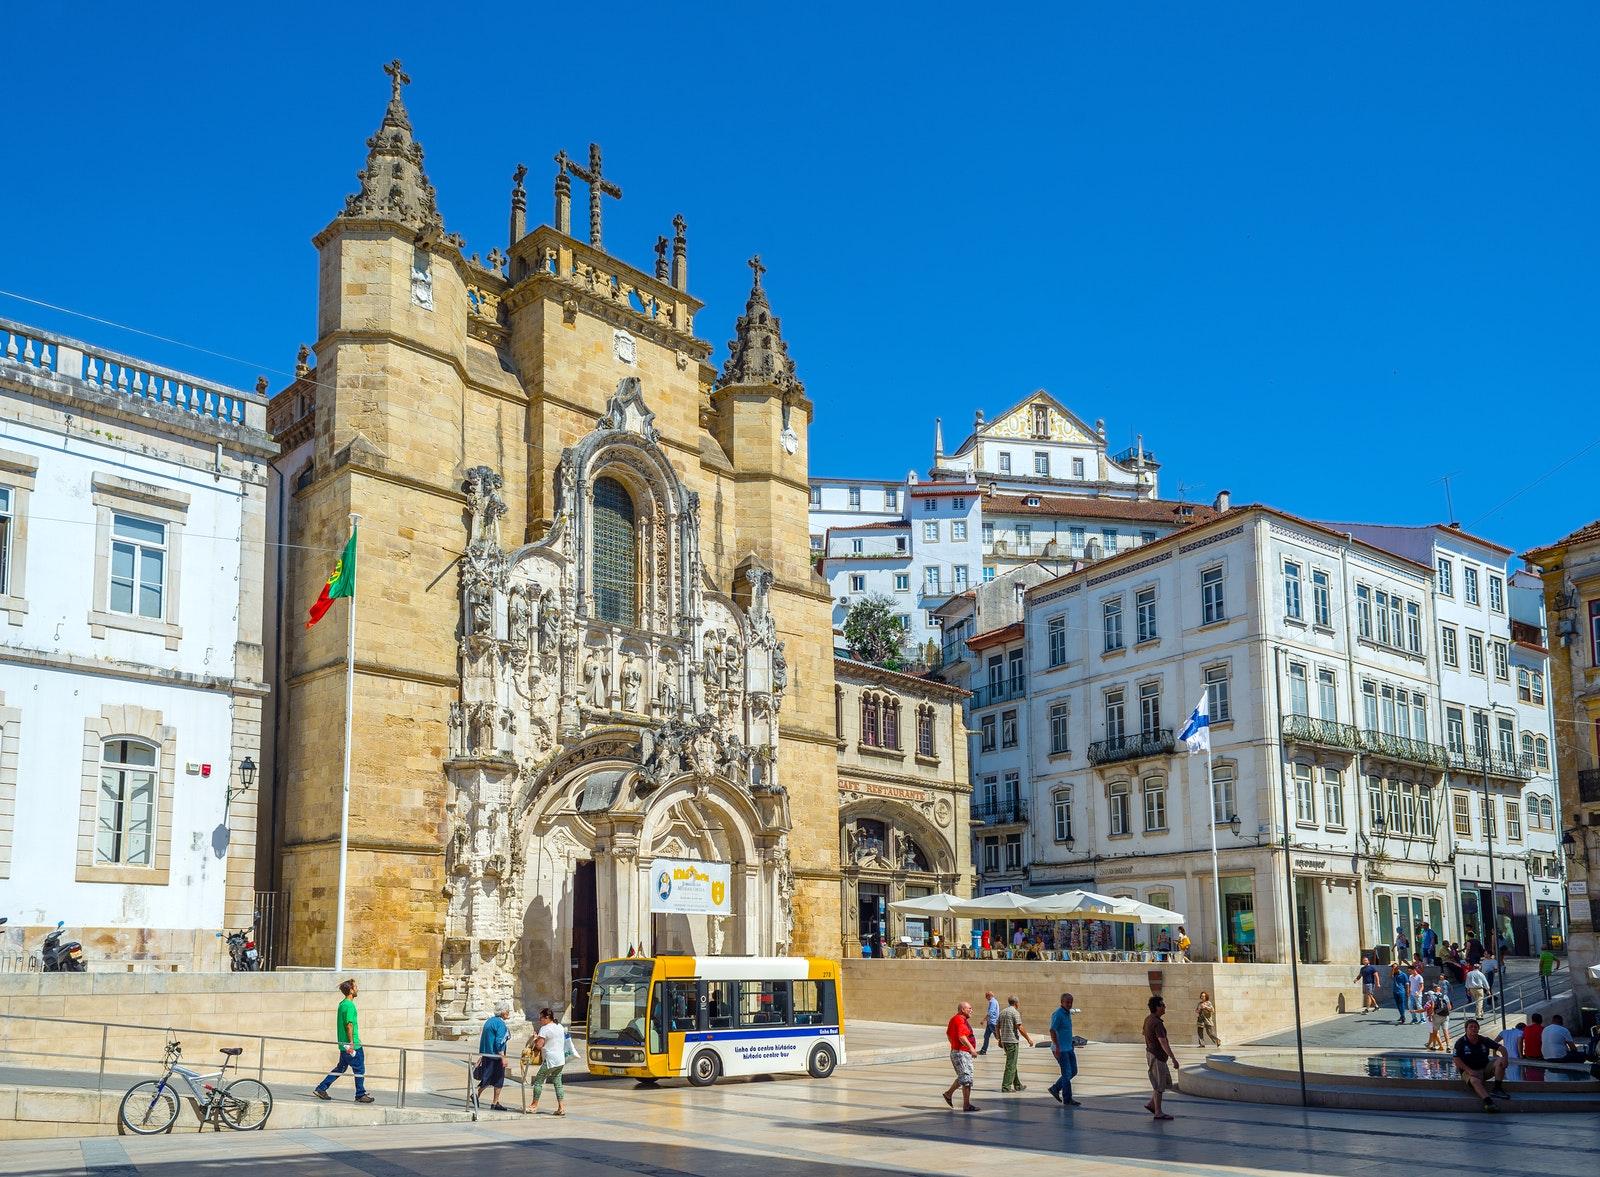 You can't miss the Monastery of the Holy Cross (Mosteiro de Santa Cruz) when you visit Coimbra